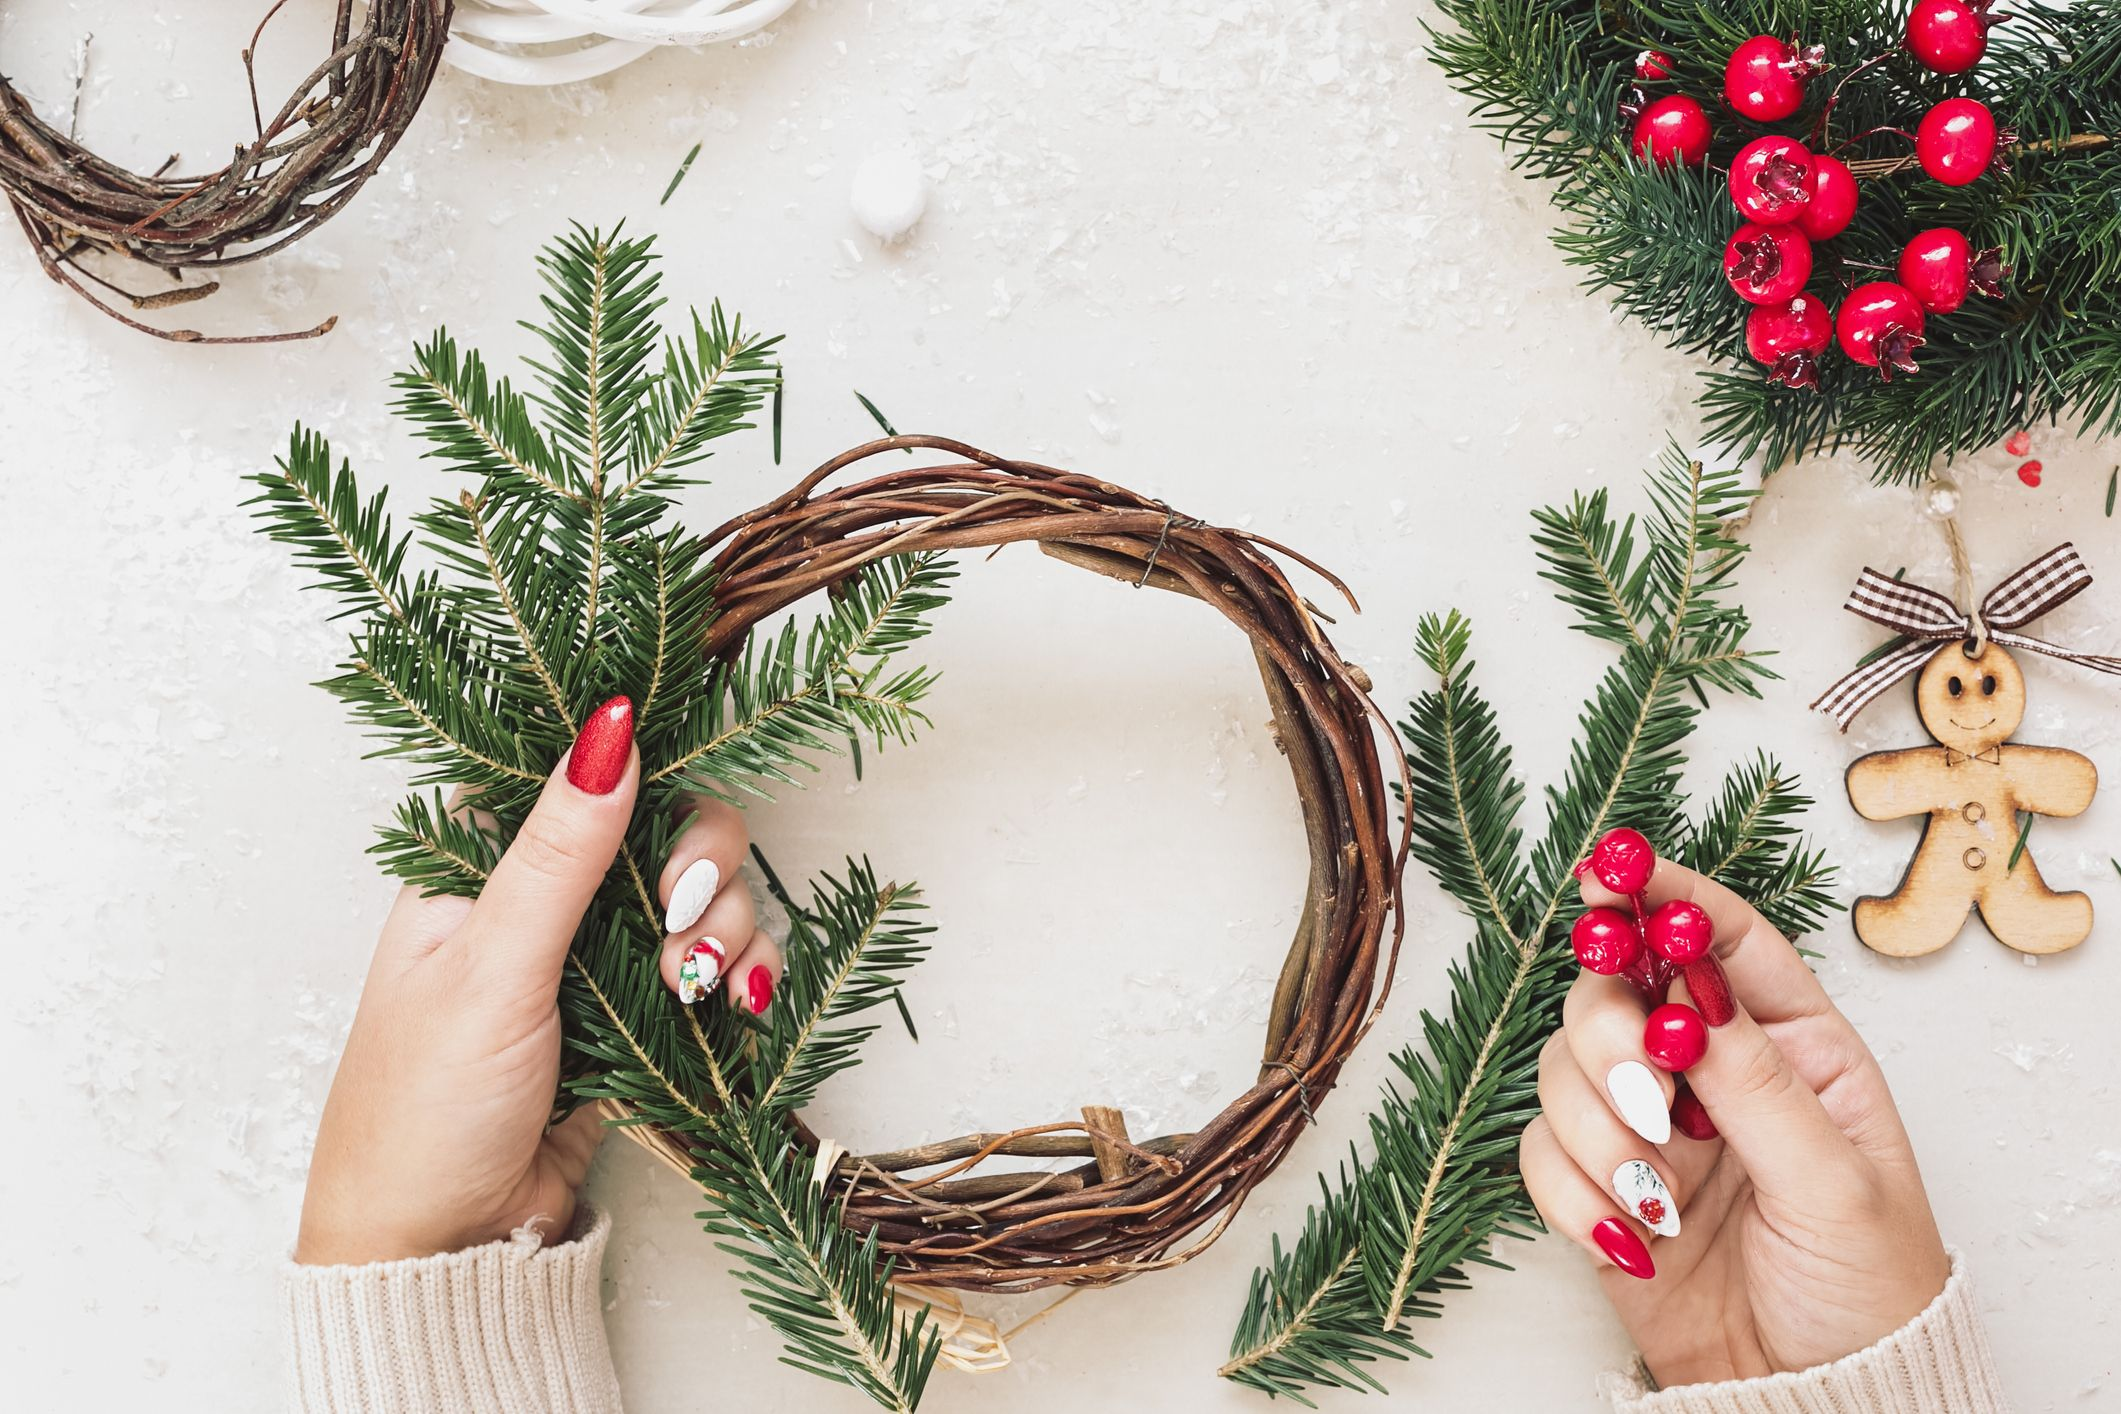 Diy Christmas Decorations 14 Diy Christmas Ideas